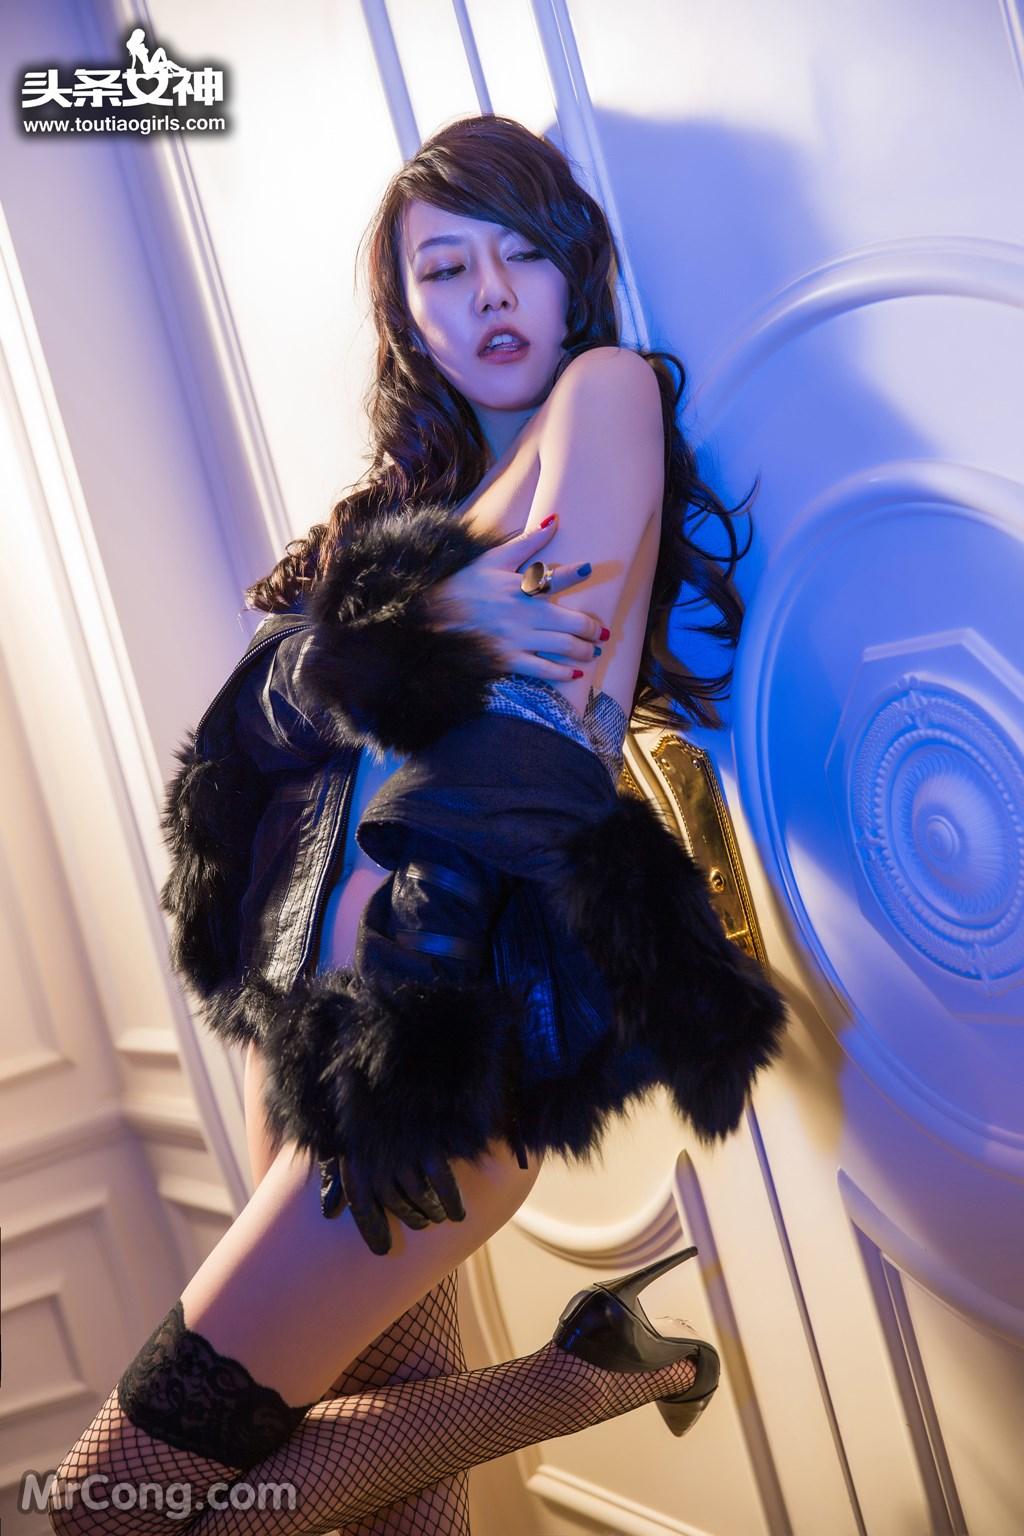 Image MrCong.com-TouTiao-2016-12-26-Dan-Dan-019 in post TouTiao 2016-12-26: Người mẫu Dan Dan (丹丹) (33 ảnh)